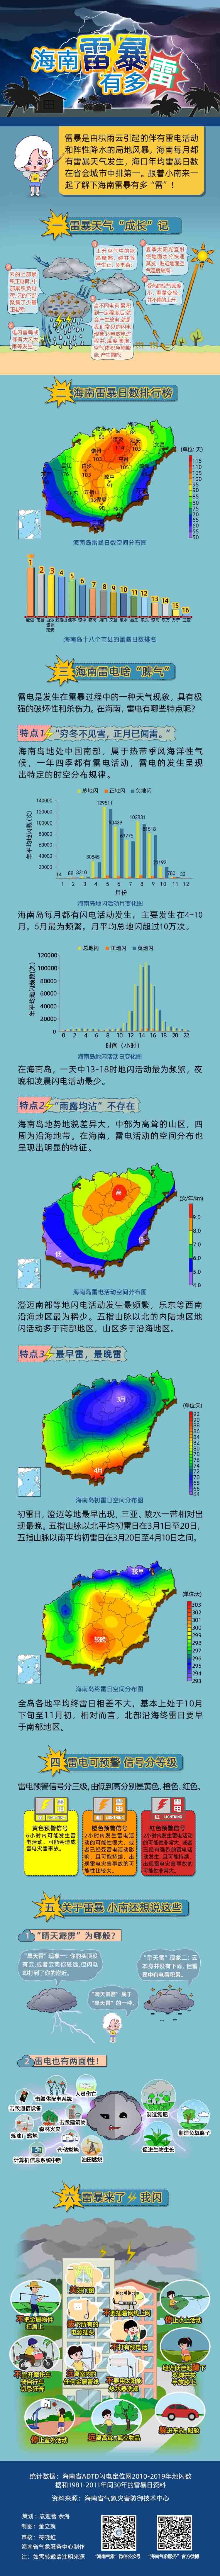 http://i.weather.com.cn/images/hainan/newzt/zt2019new/2021/04/29/1619663509338017662.jpg